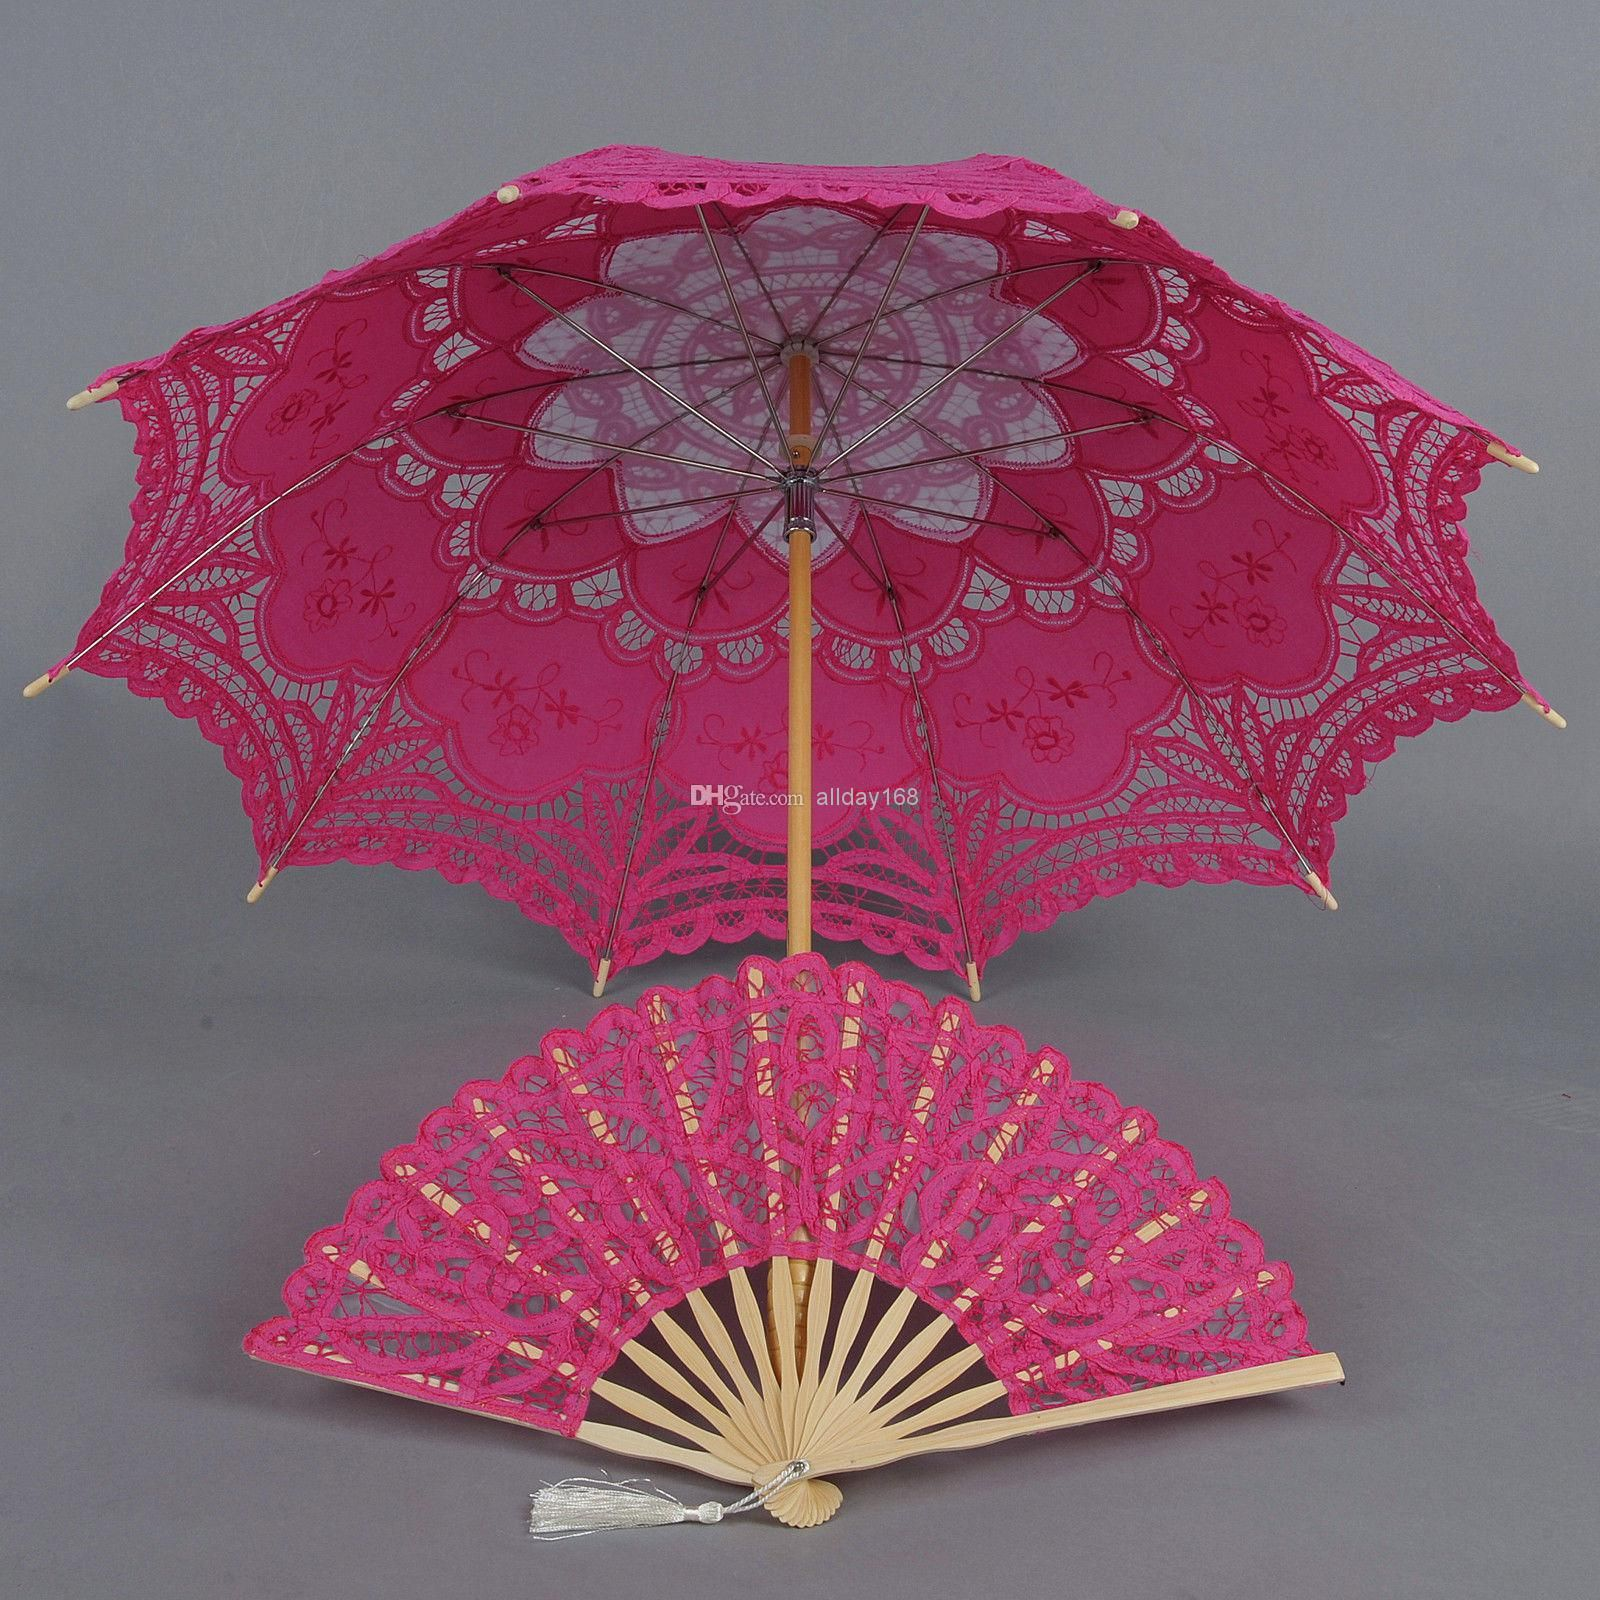 parasol umbrella - Google Search